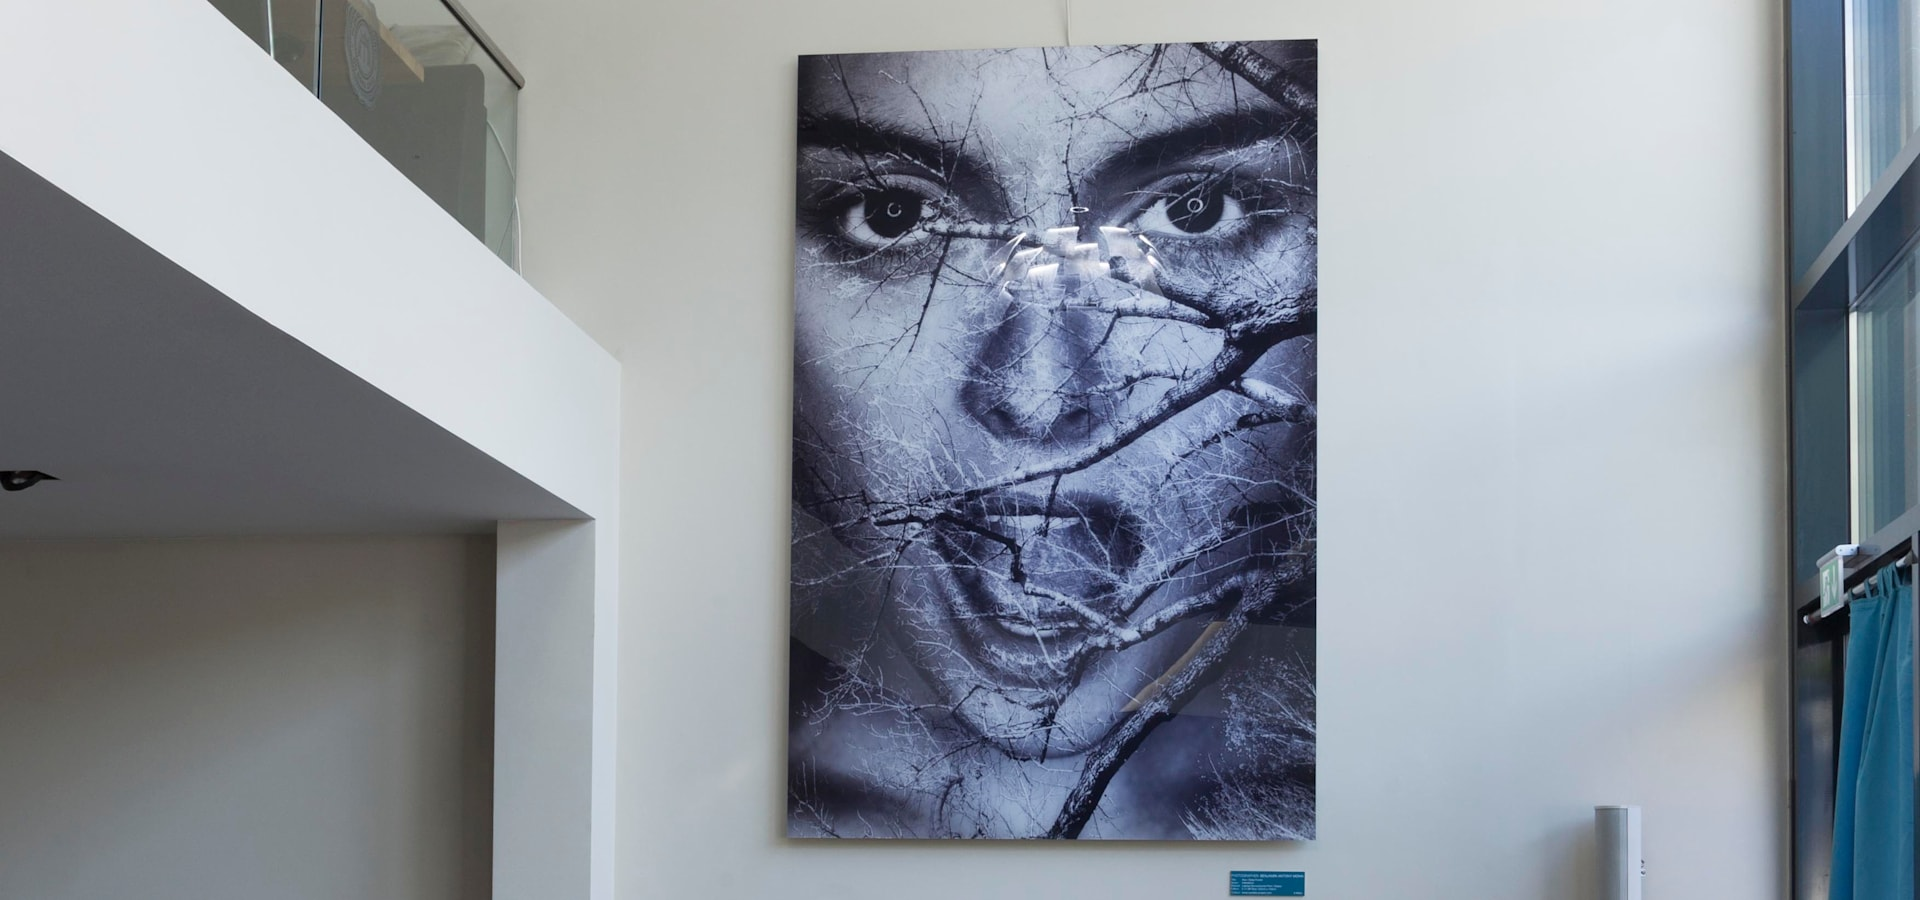 neonwhite design und STUDIO DENISE M. HACHINGER